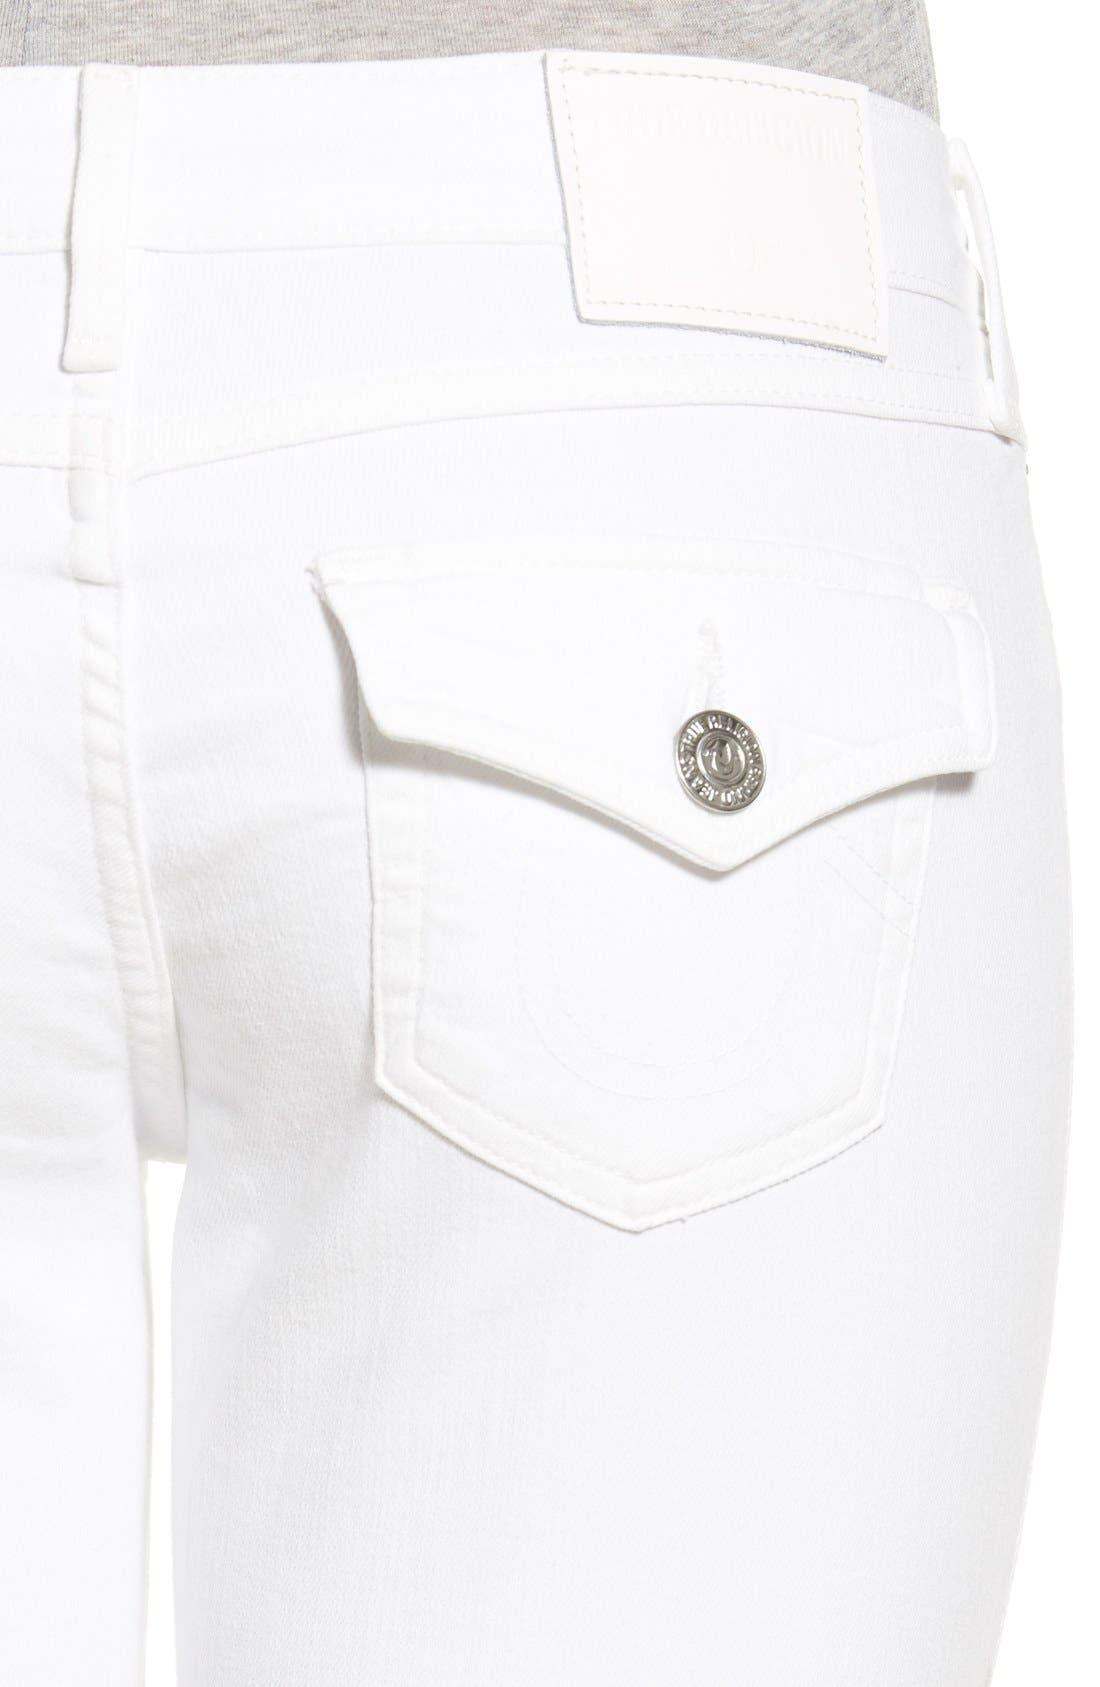 Alternate Image 4  - True Religion Brand Jeans 'Casey' Flap Pocket Skinny Jeans (Optic White)